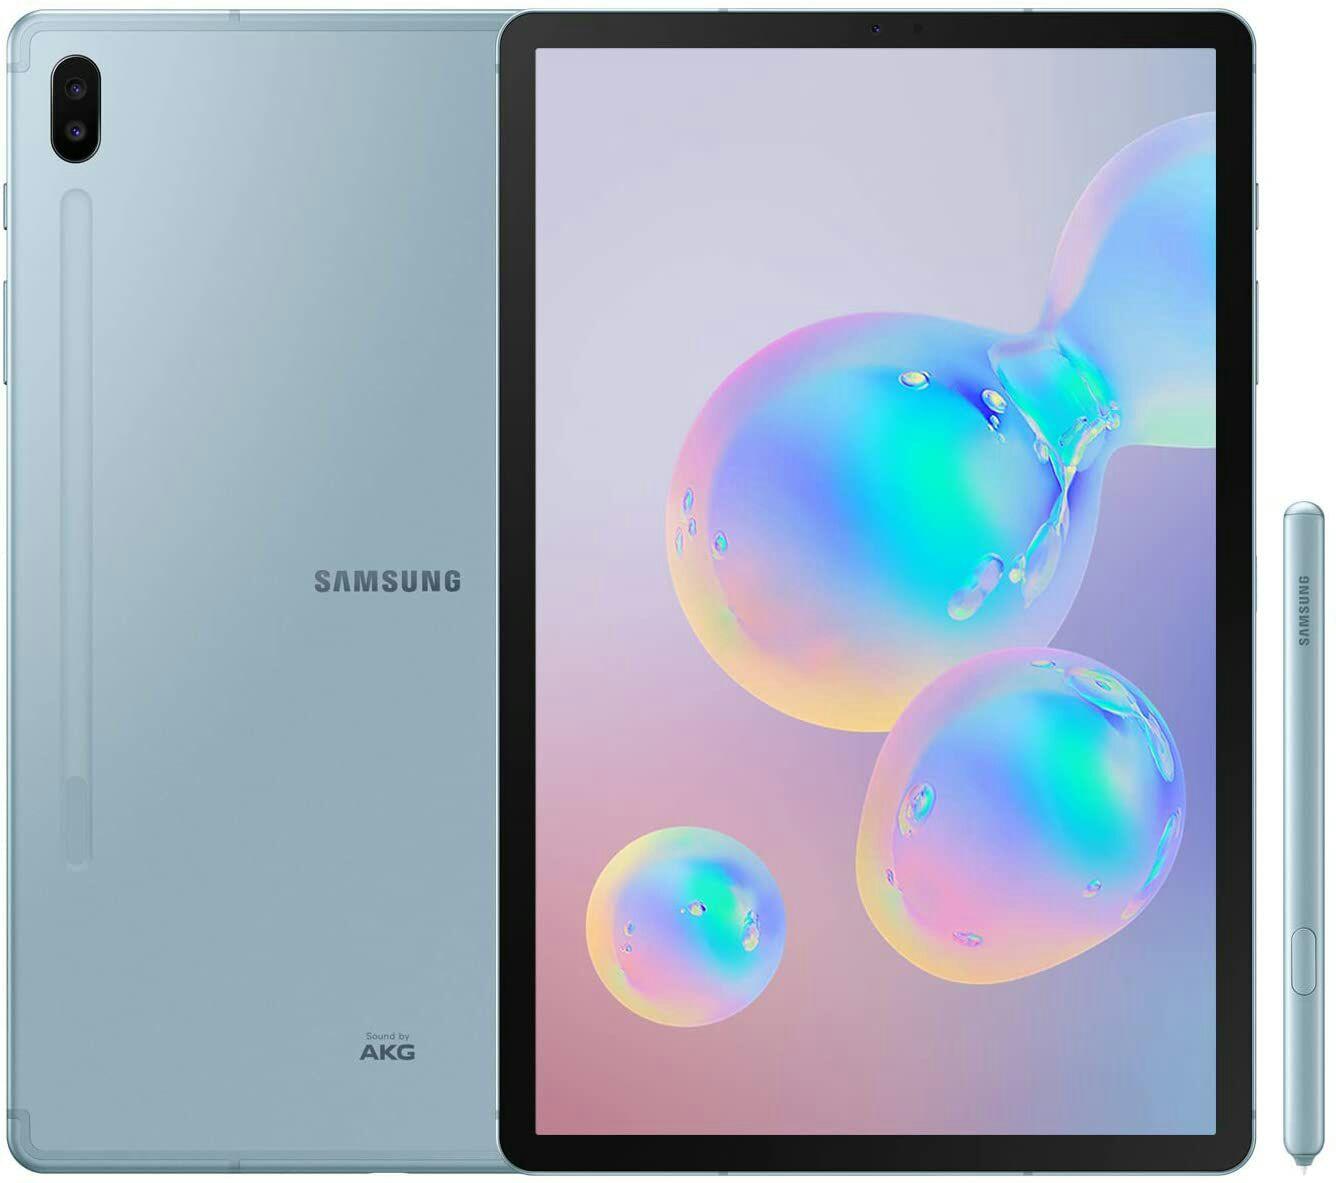 "Tablette 10.5"" Samsung Galaxy Tab S6 (4G) - sAMOLED, Qualcomm Snapdragon 855, 6 go de RAM, 128 Go Android 9 Pie"